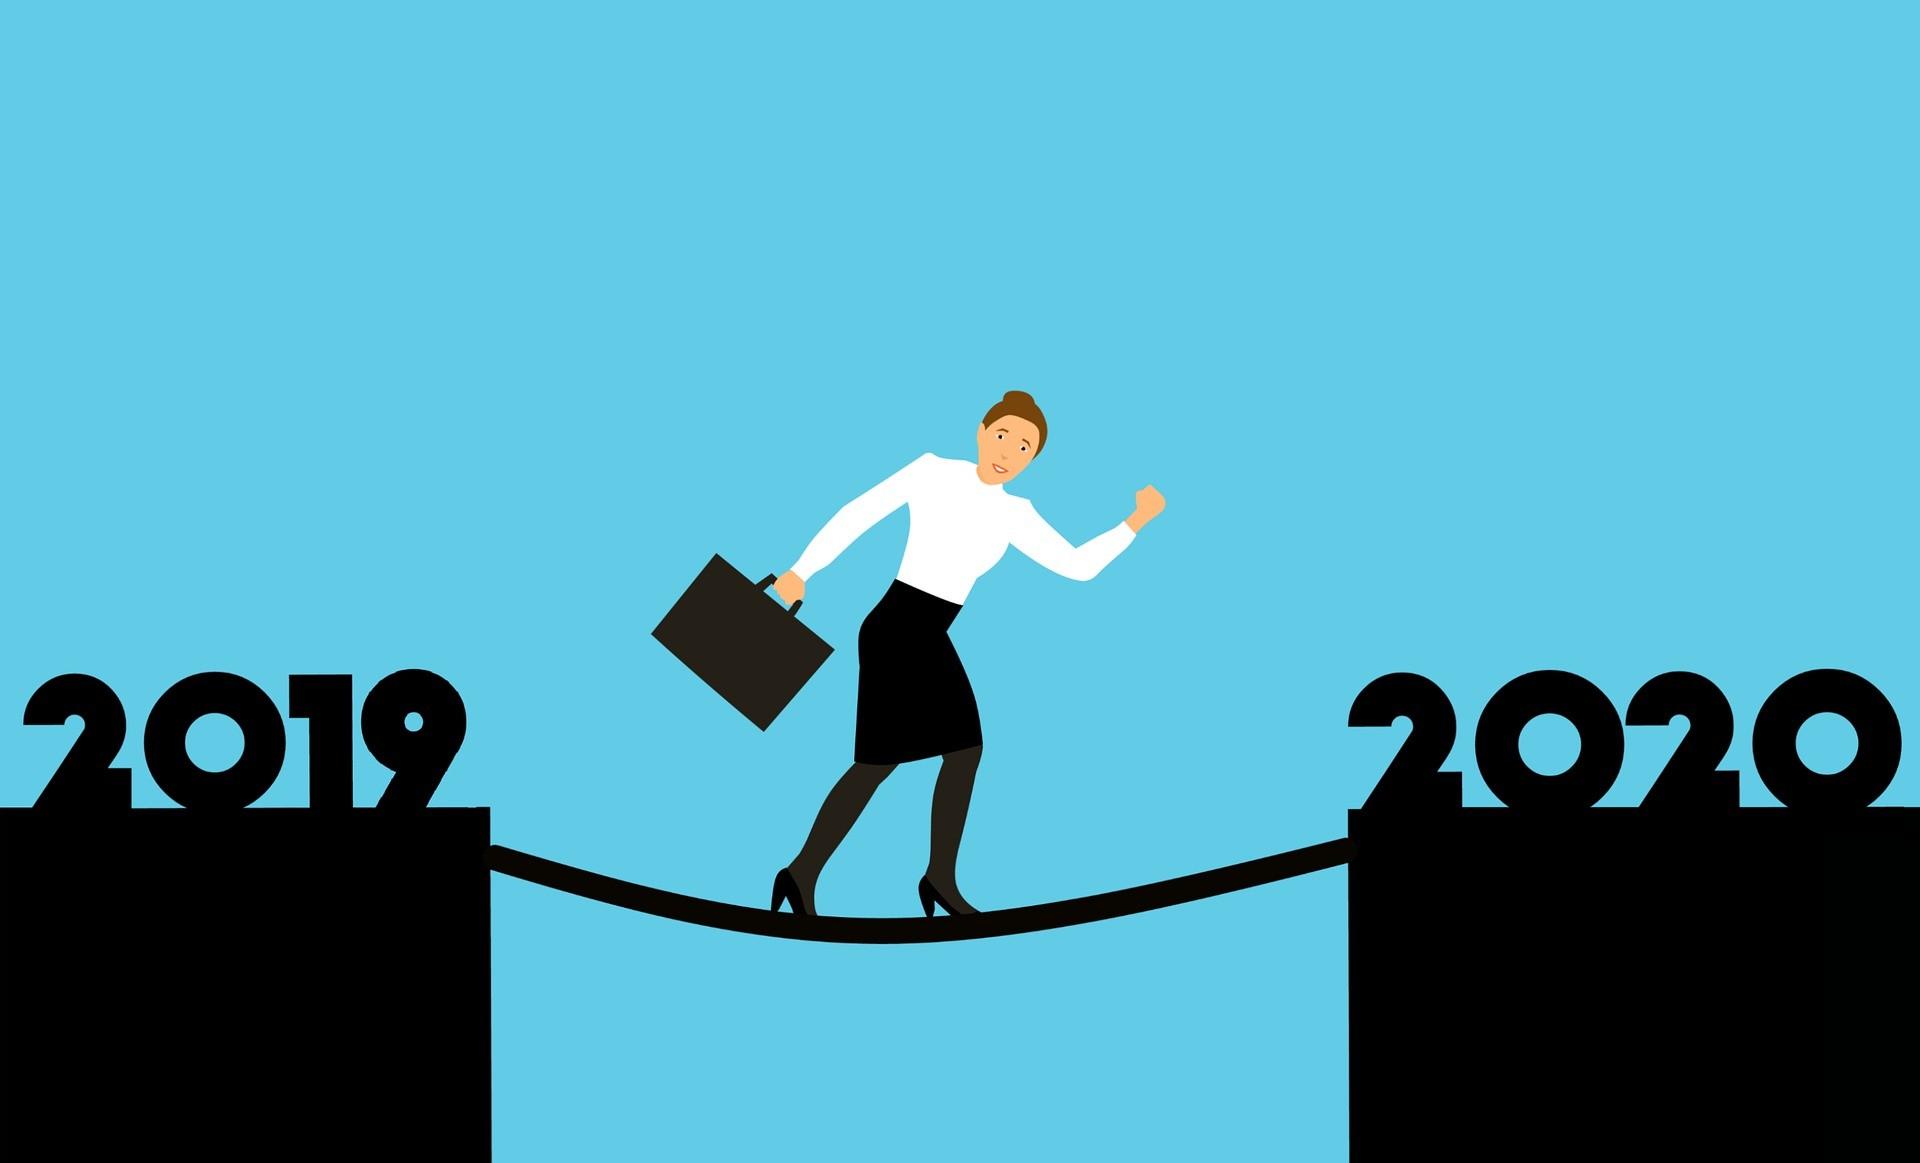 tendances marketing digital 2020